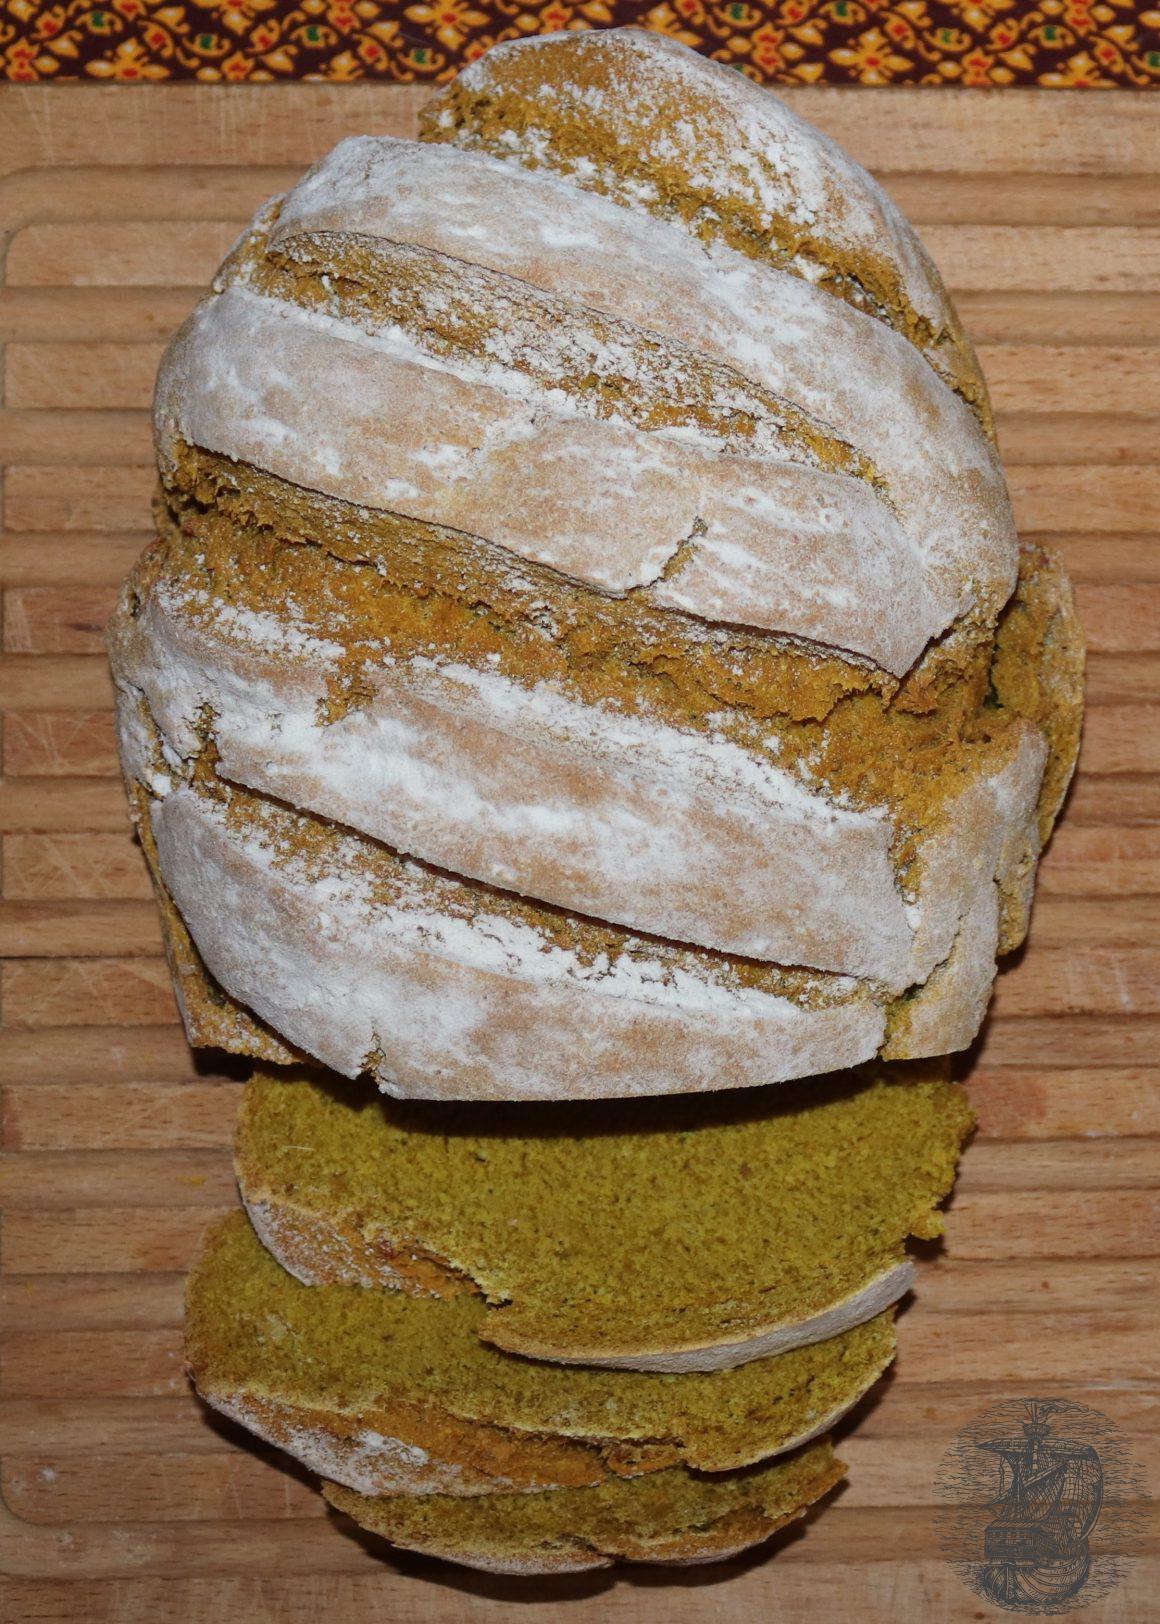 Turmeric bread